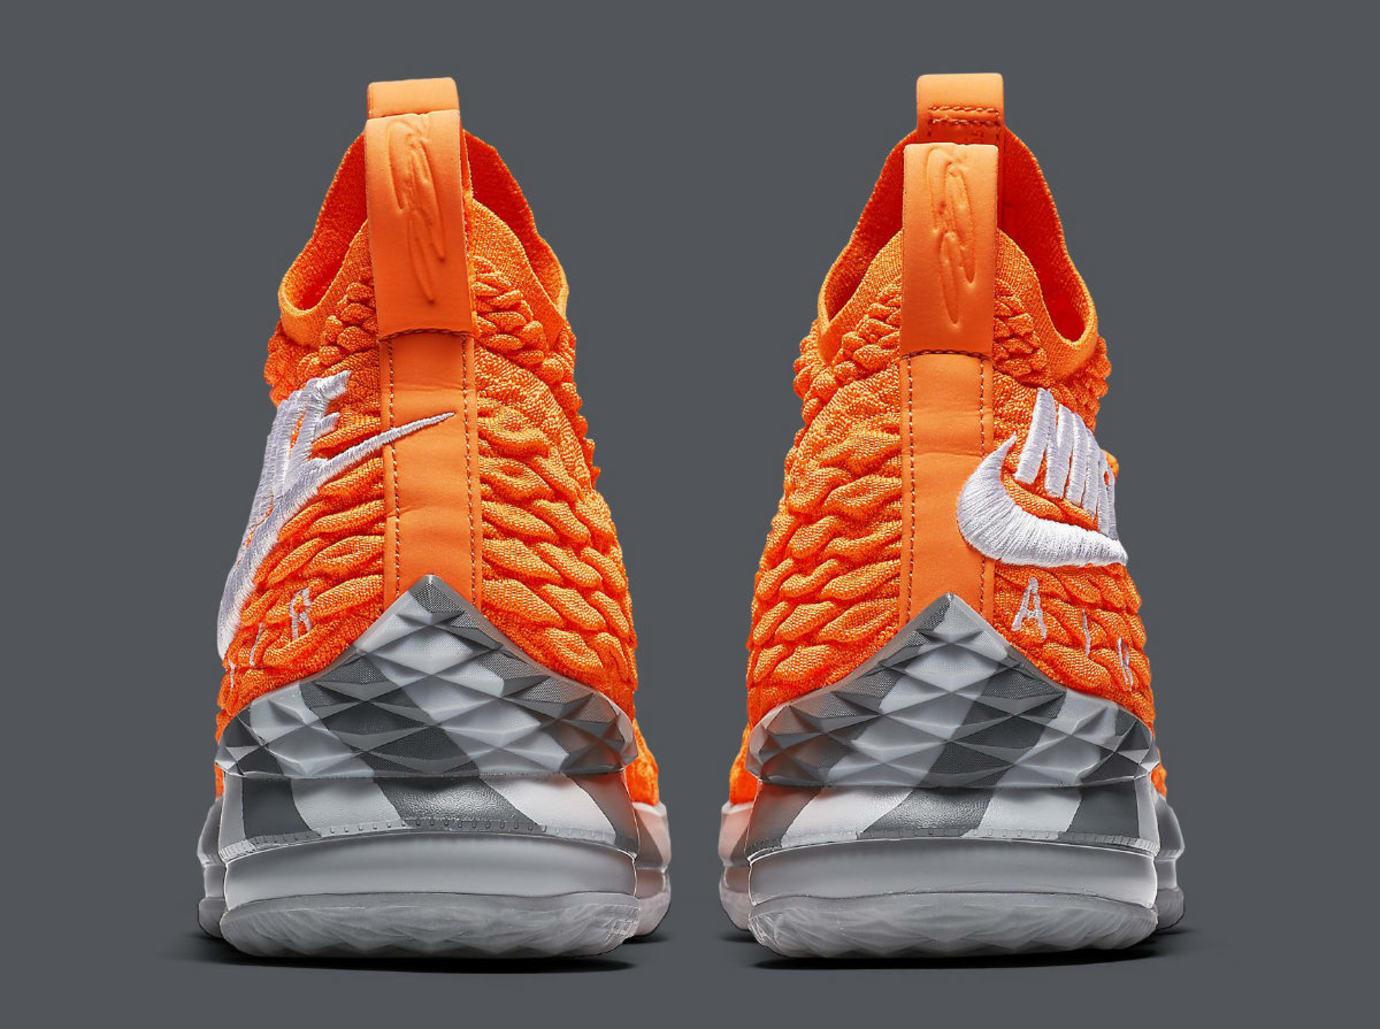 c2dee2913a6 Nike LeBron 15 Orange Box Release Date AR5125-800 Heel